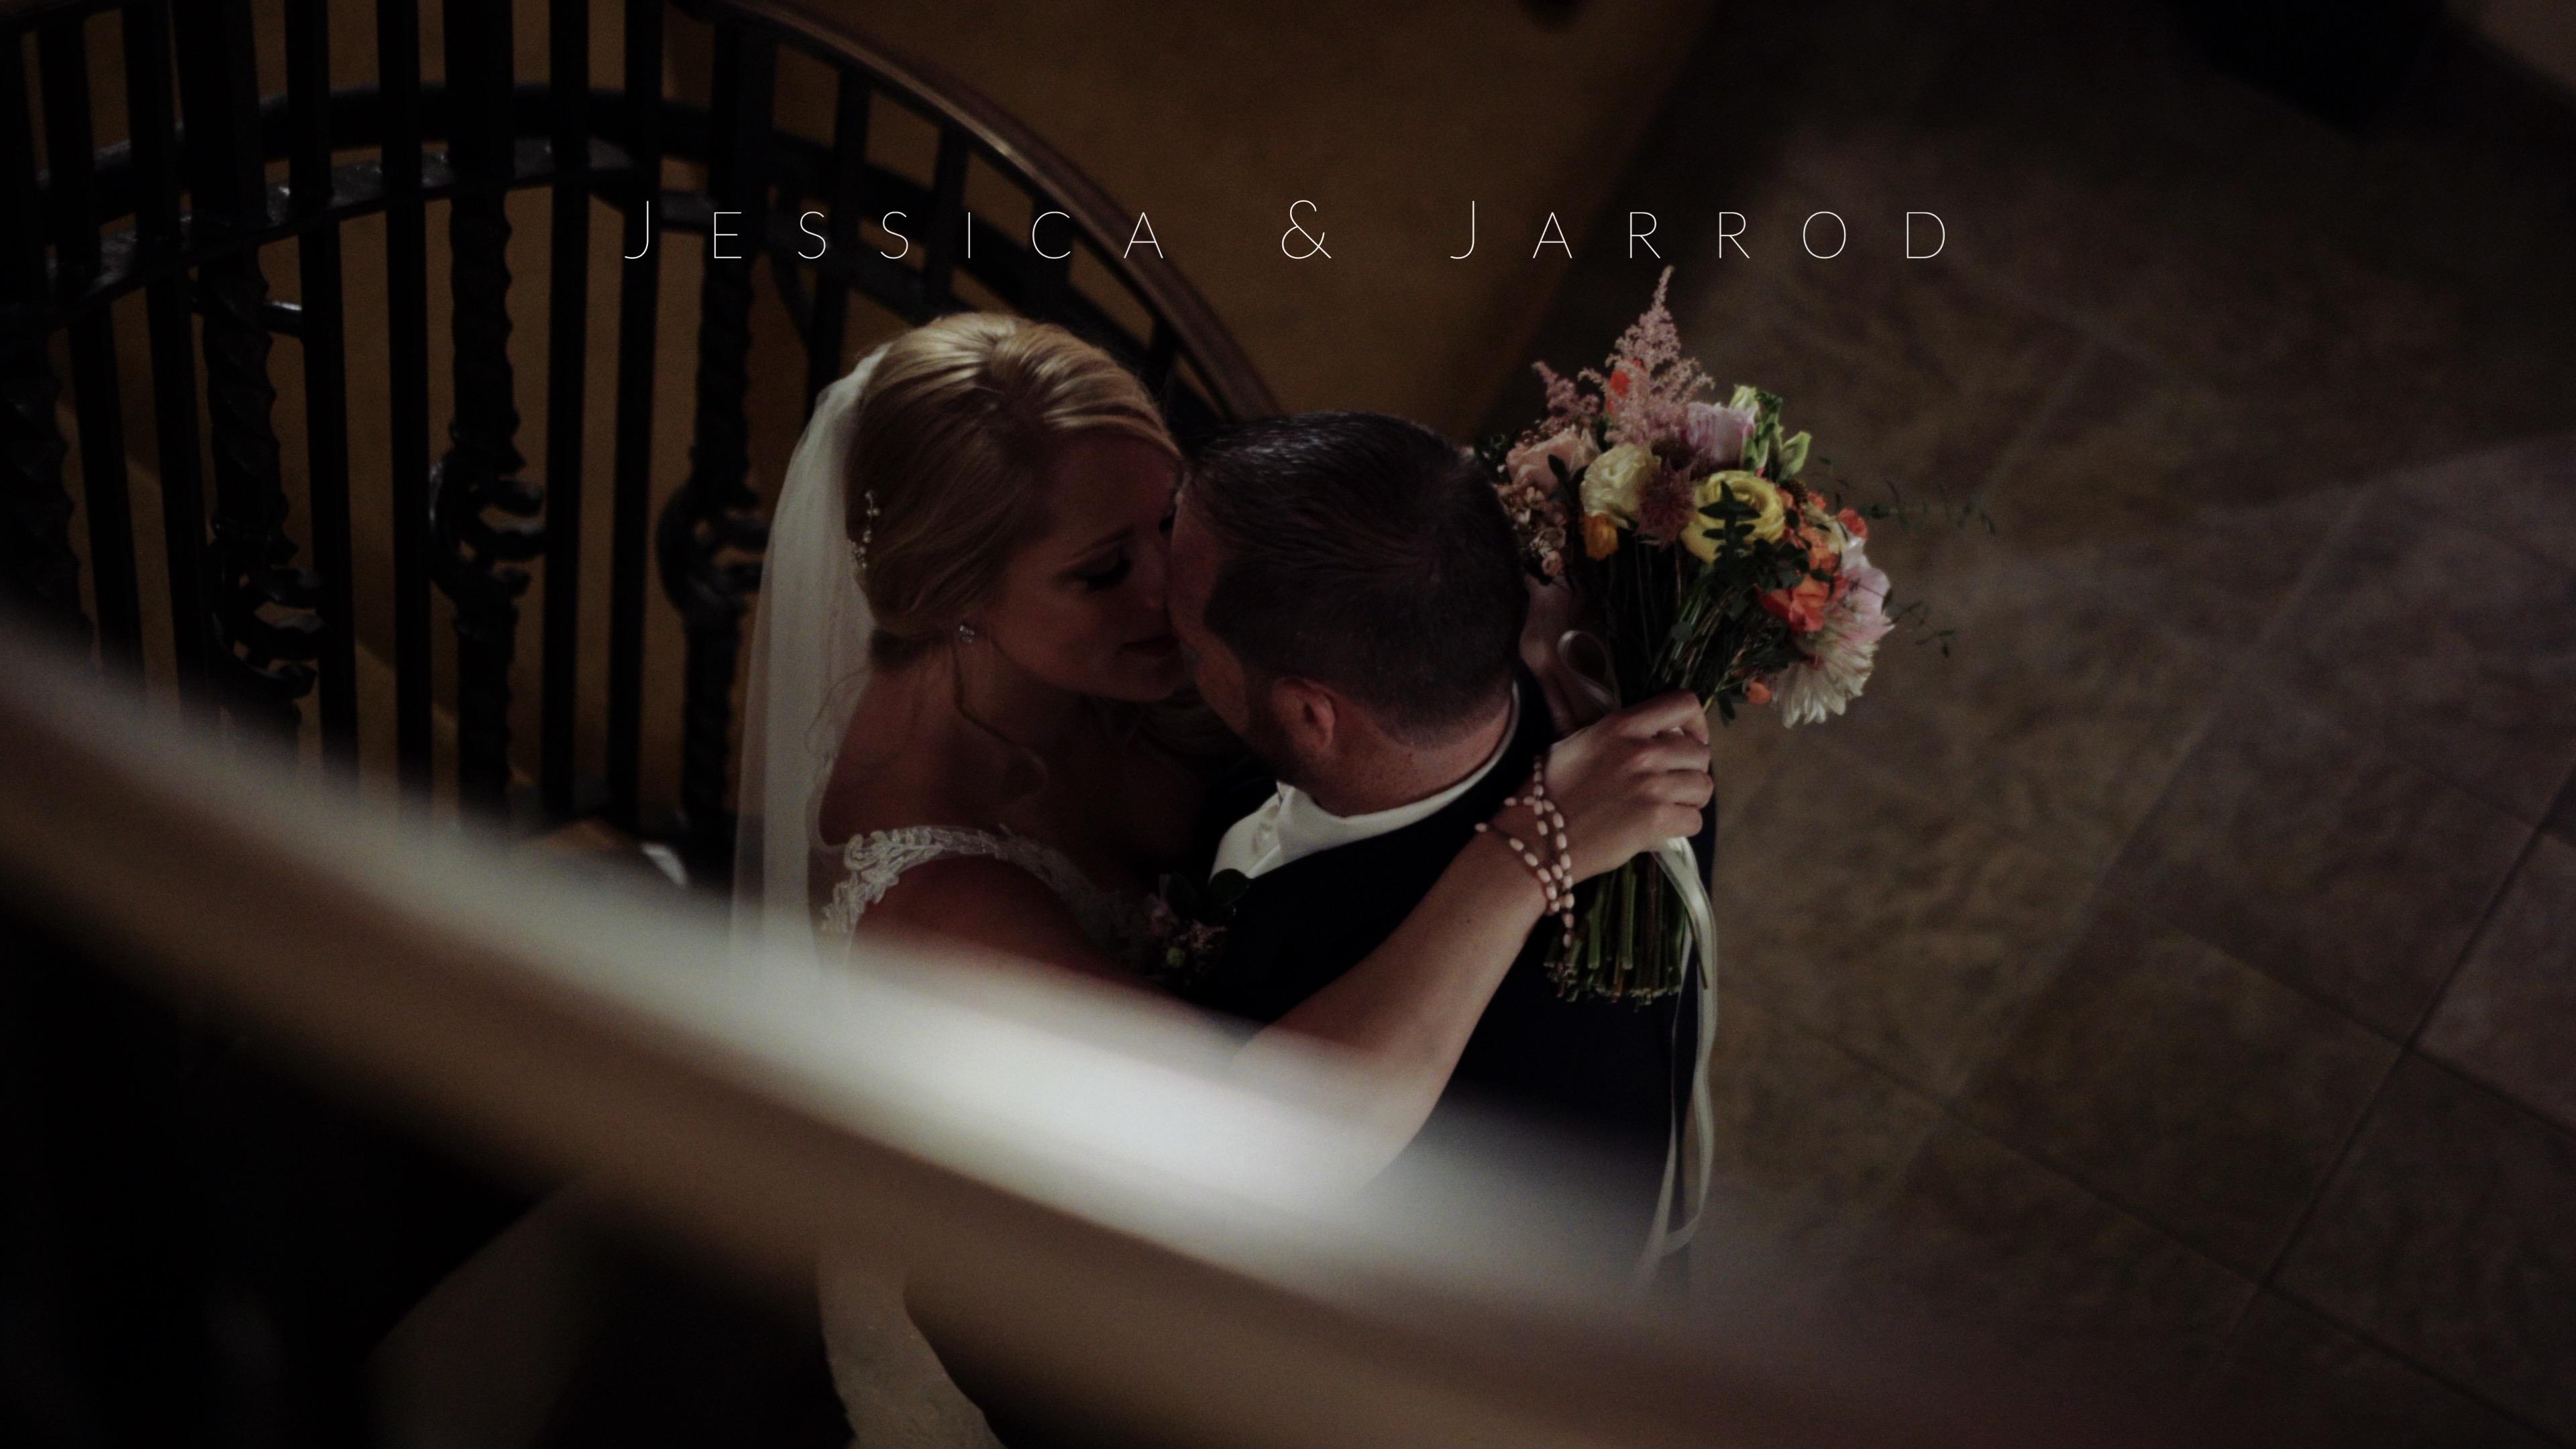 Jessica + Jarrod   Orlando, Florida   Gaylord Palms Orlando Resort